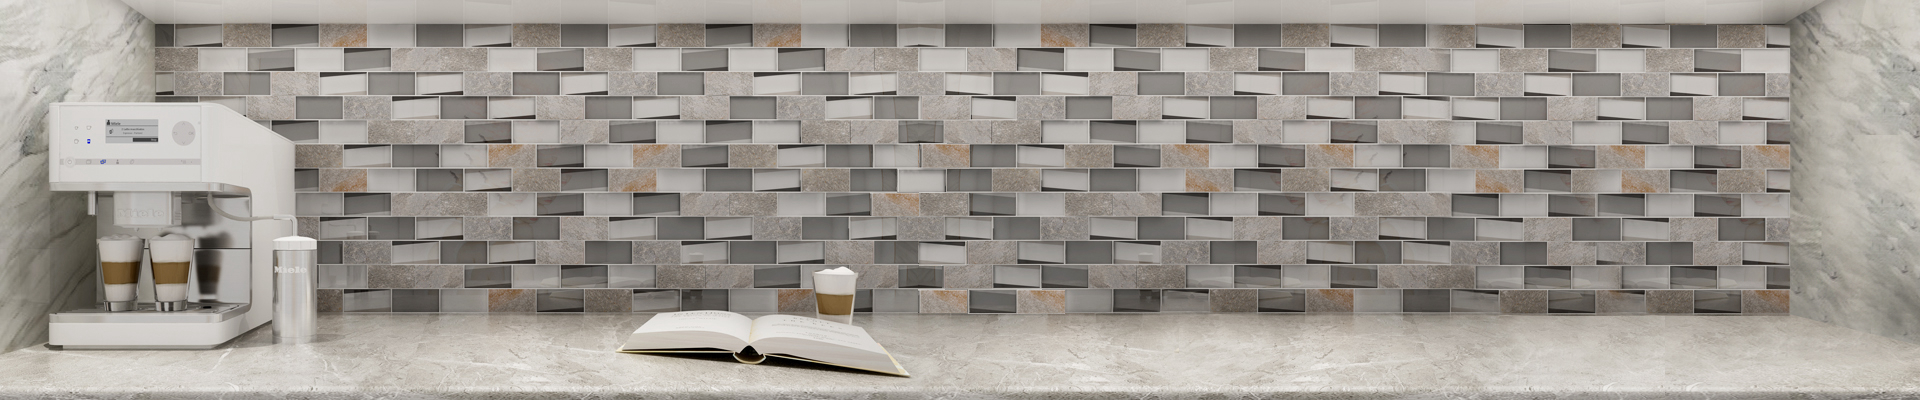 video-wall mosaic kitchen backsplash factory price for bathroom Heng Xing-Heng Xing-img